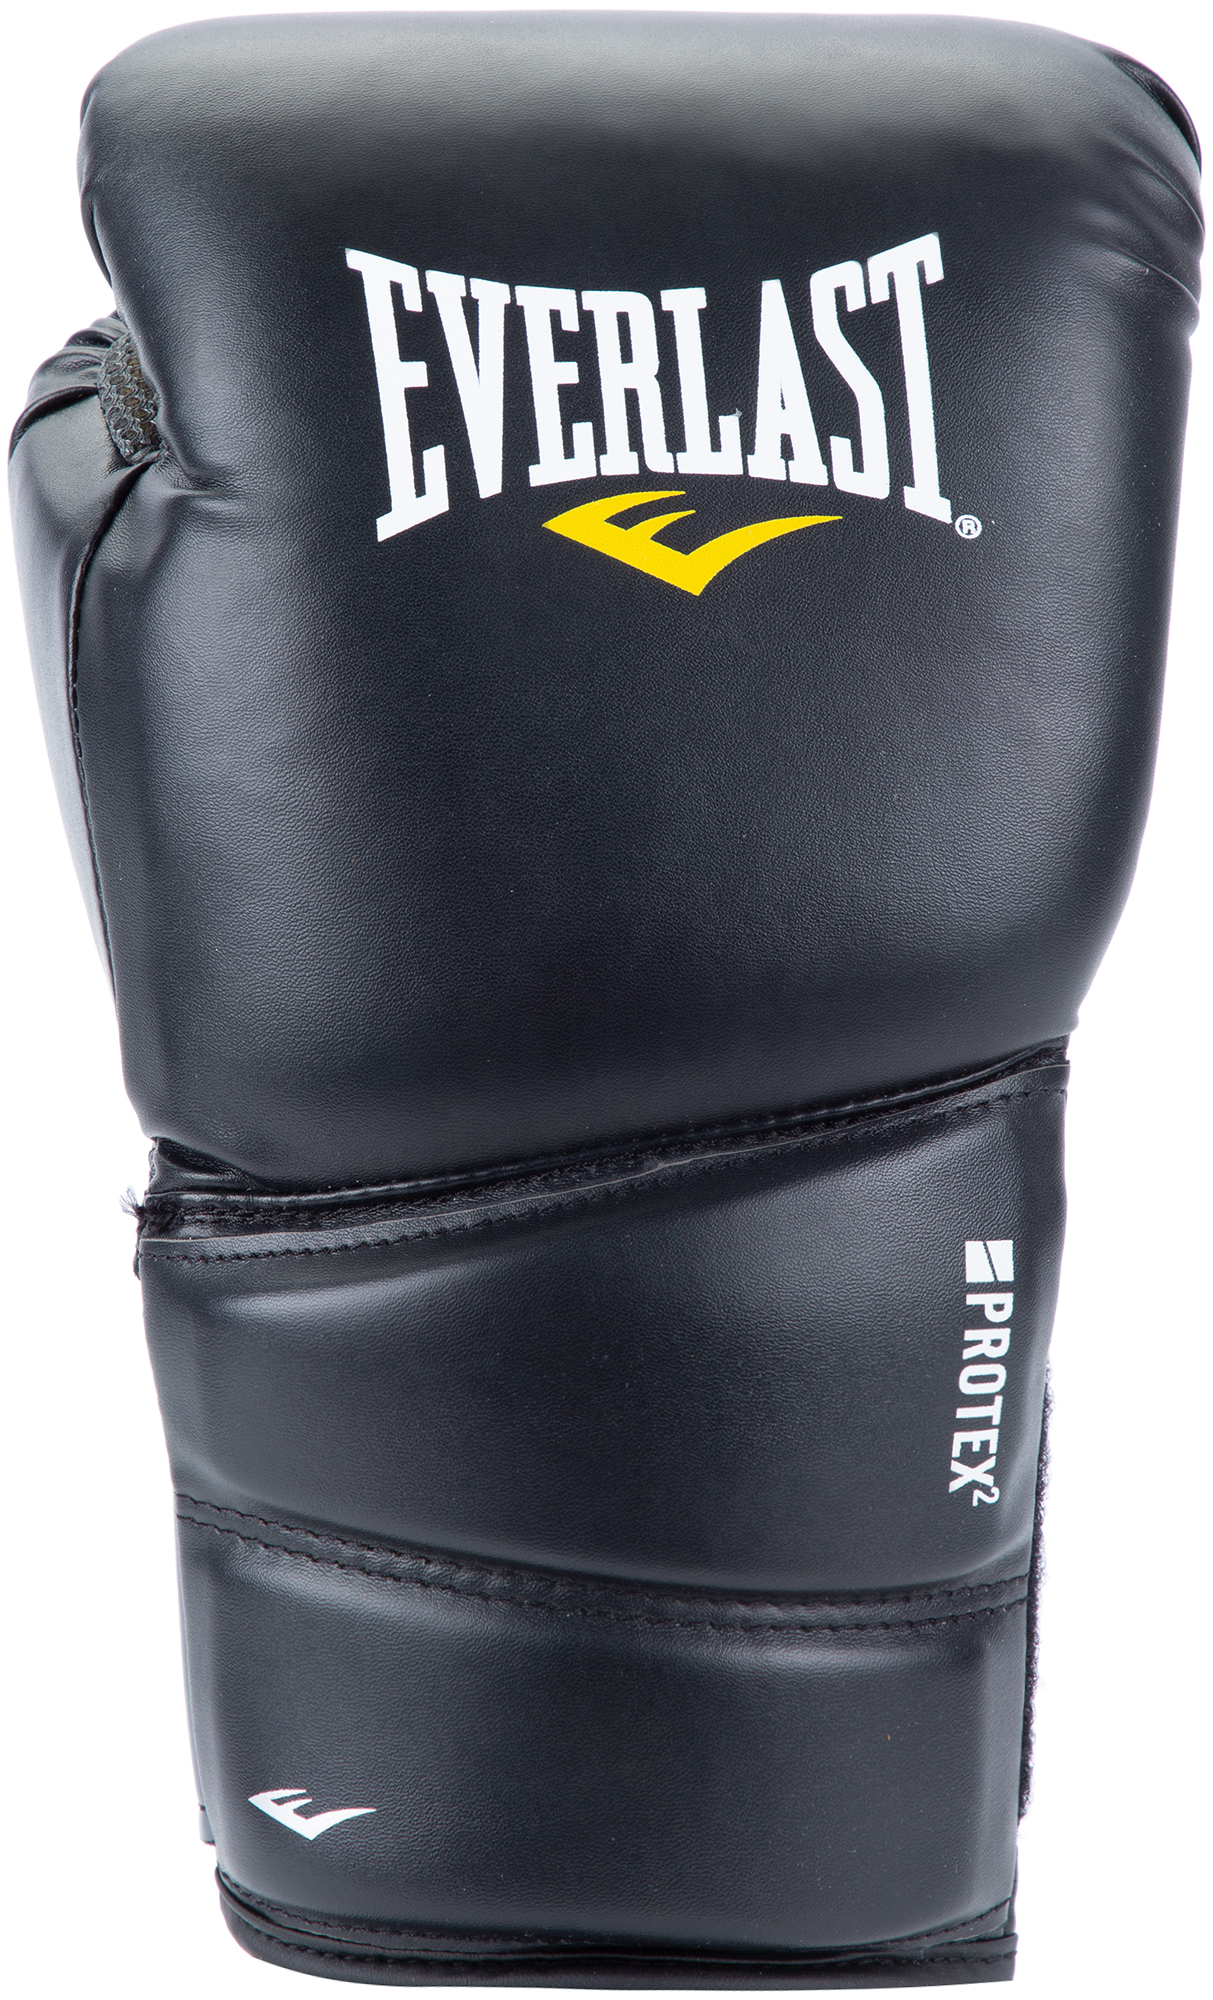 Everlast Перчатки боксерские Everlast Protex2, размер 12 oz цена